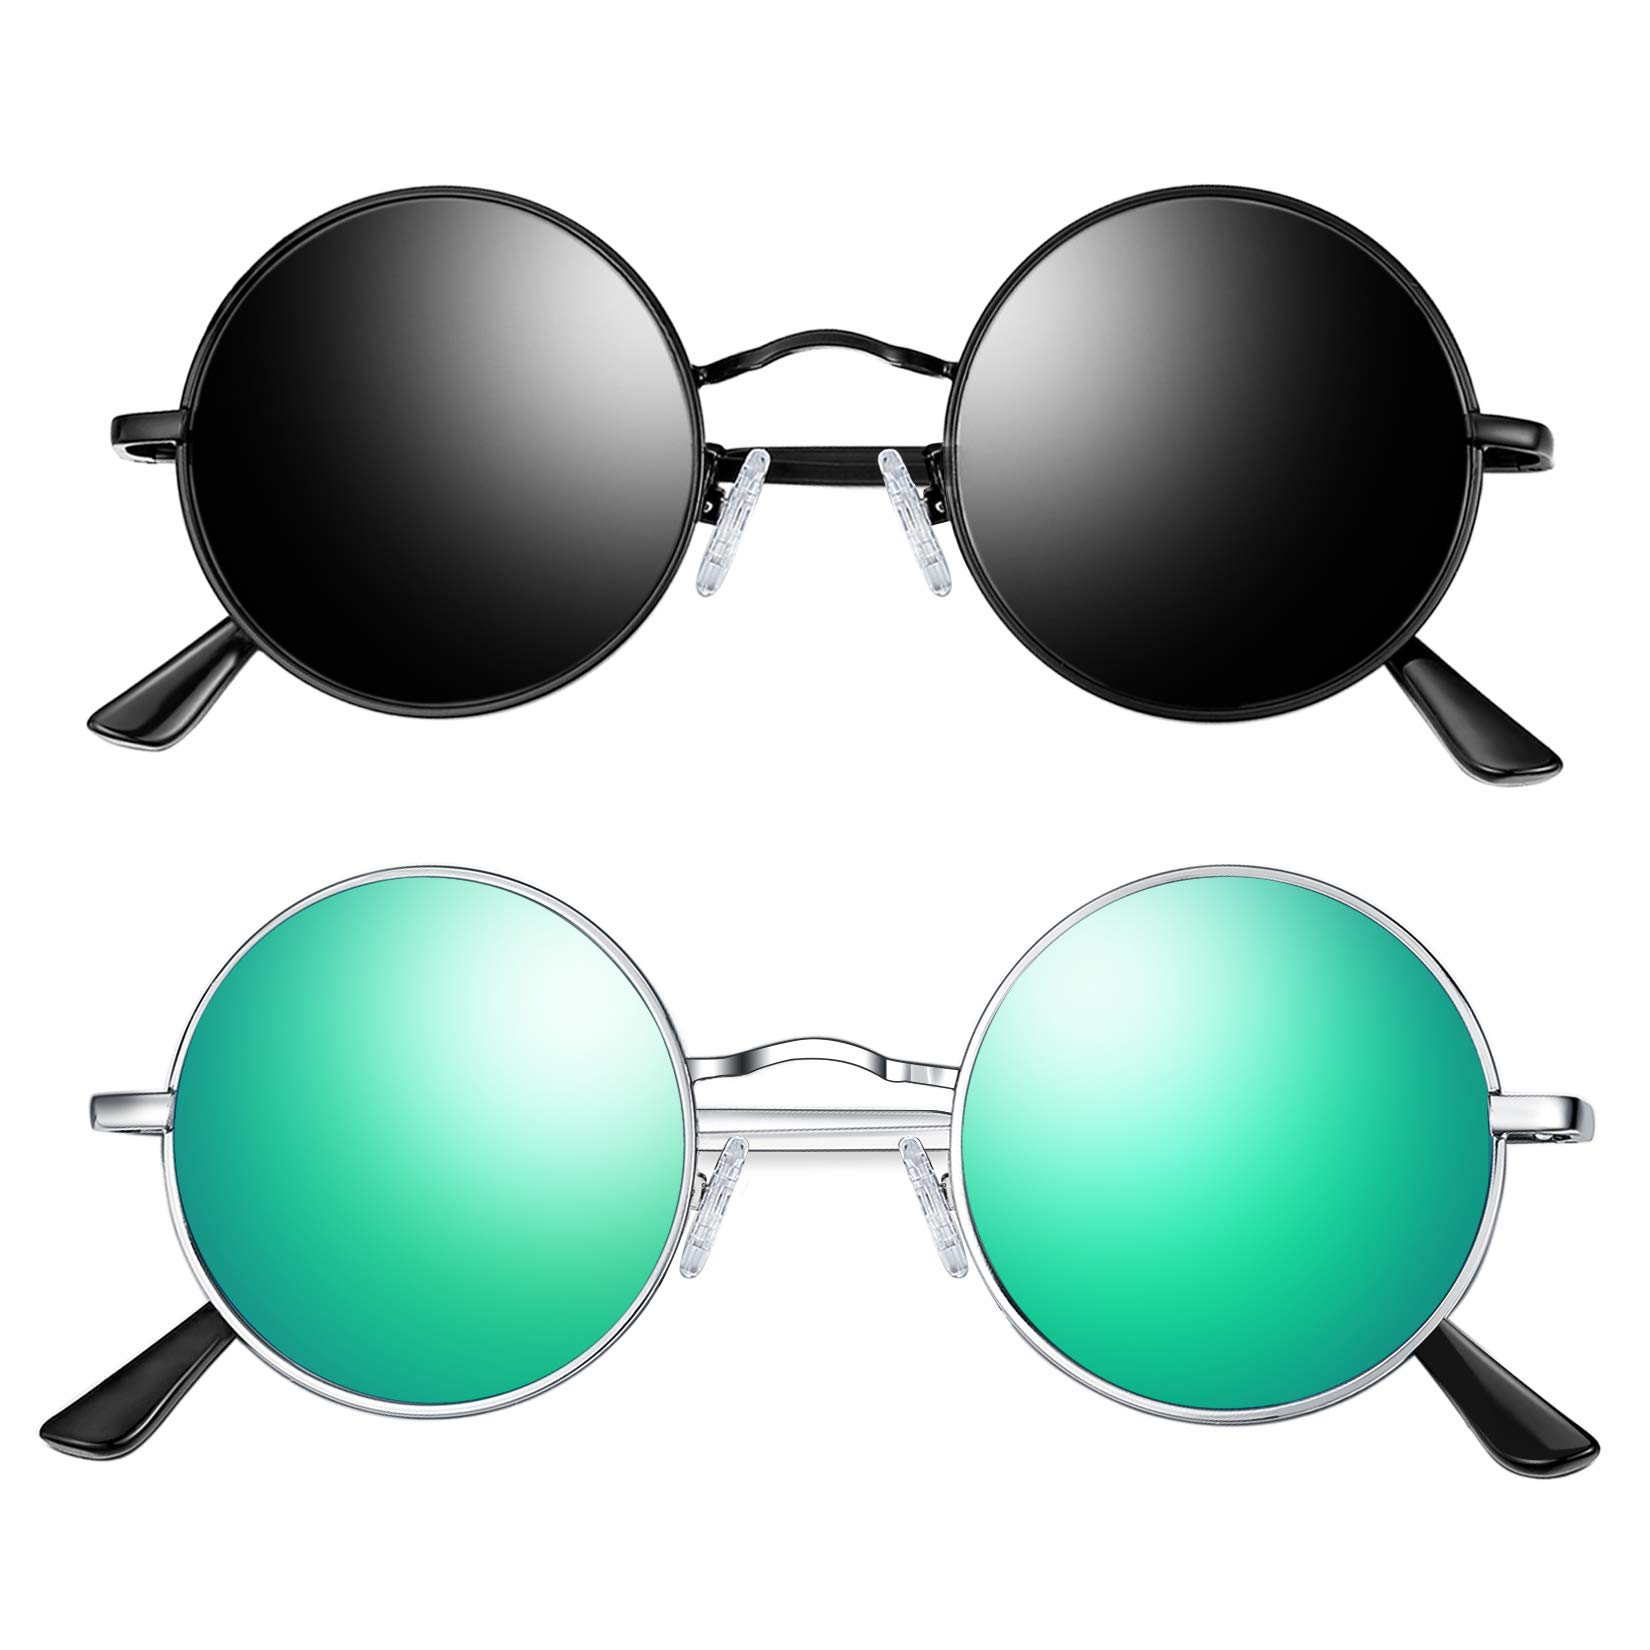 Joopin Lennon Round Sunglasses for Men Women, 2 Pack Small Circle Hippie Sunglasses Polarized (Black+Green) by Joopin